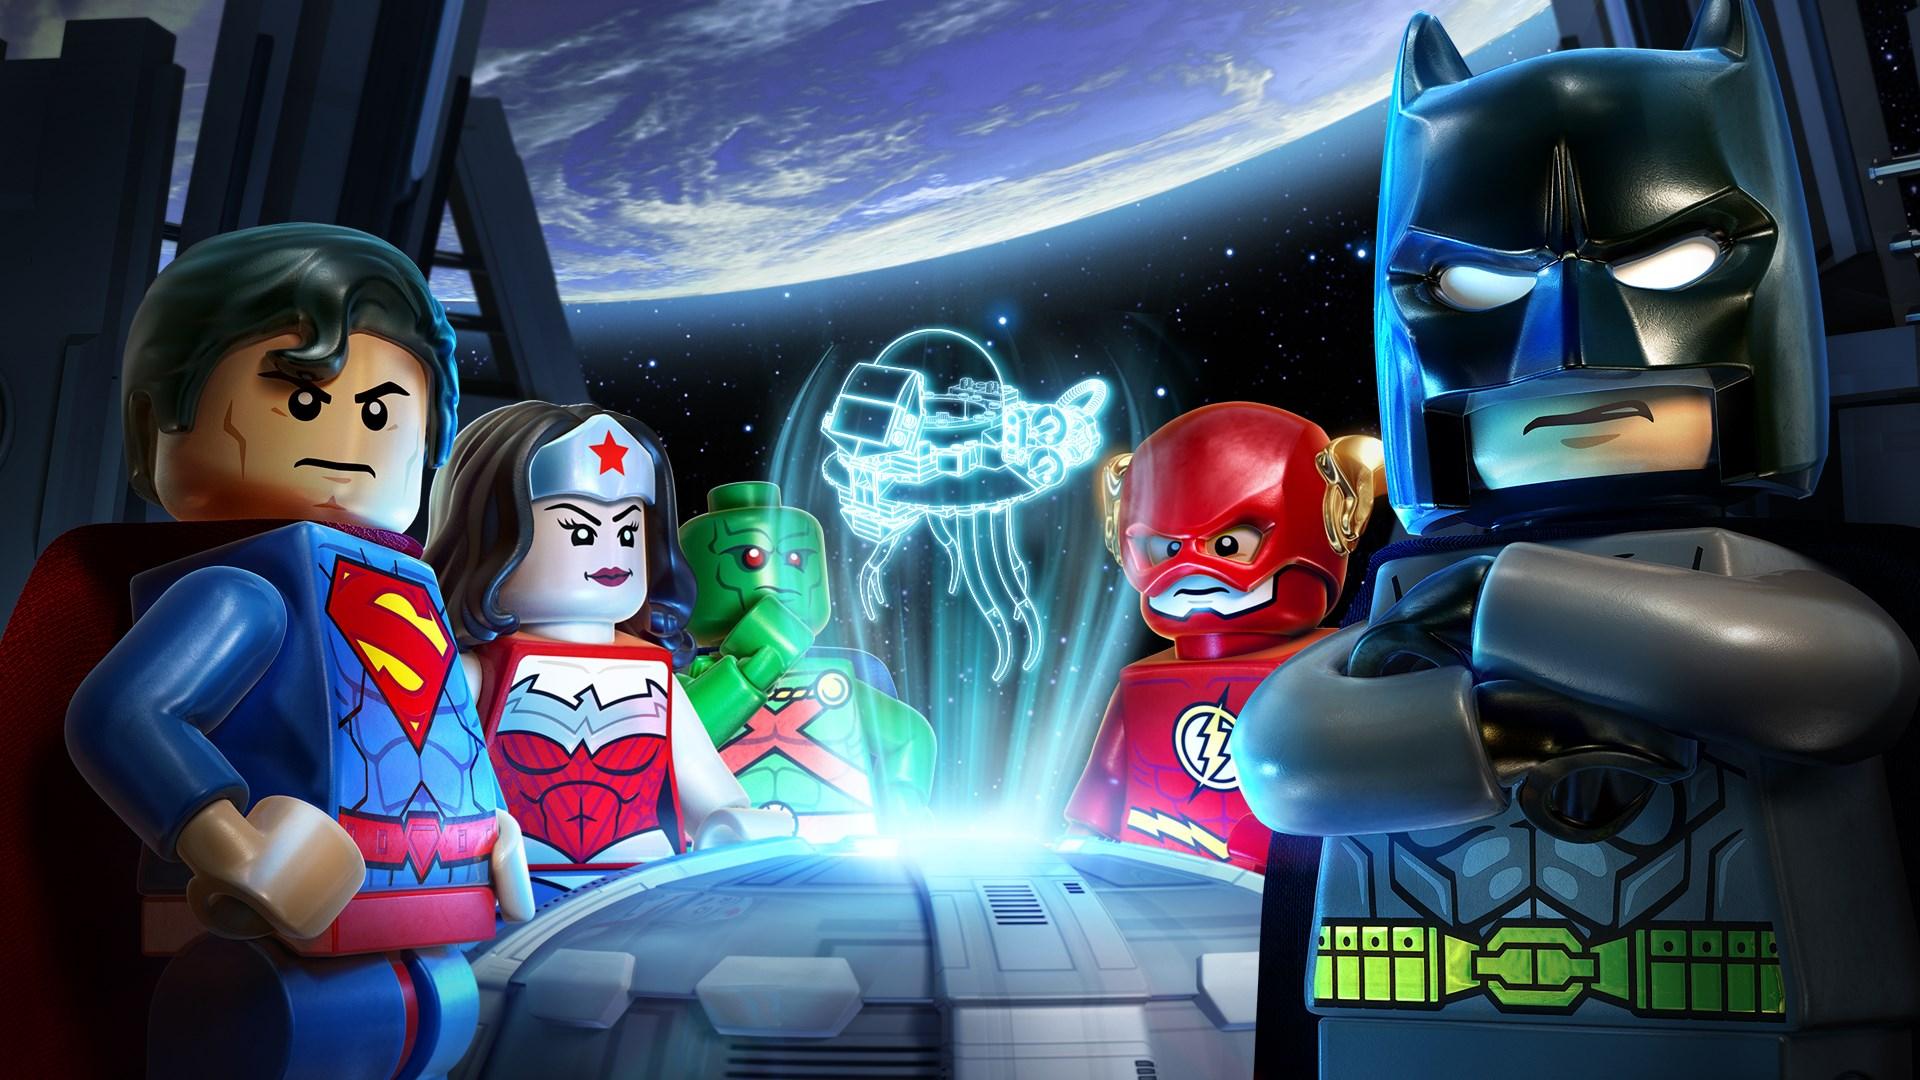 скачать лего бэтмен на андроид